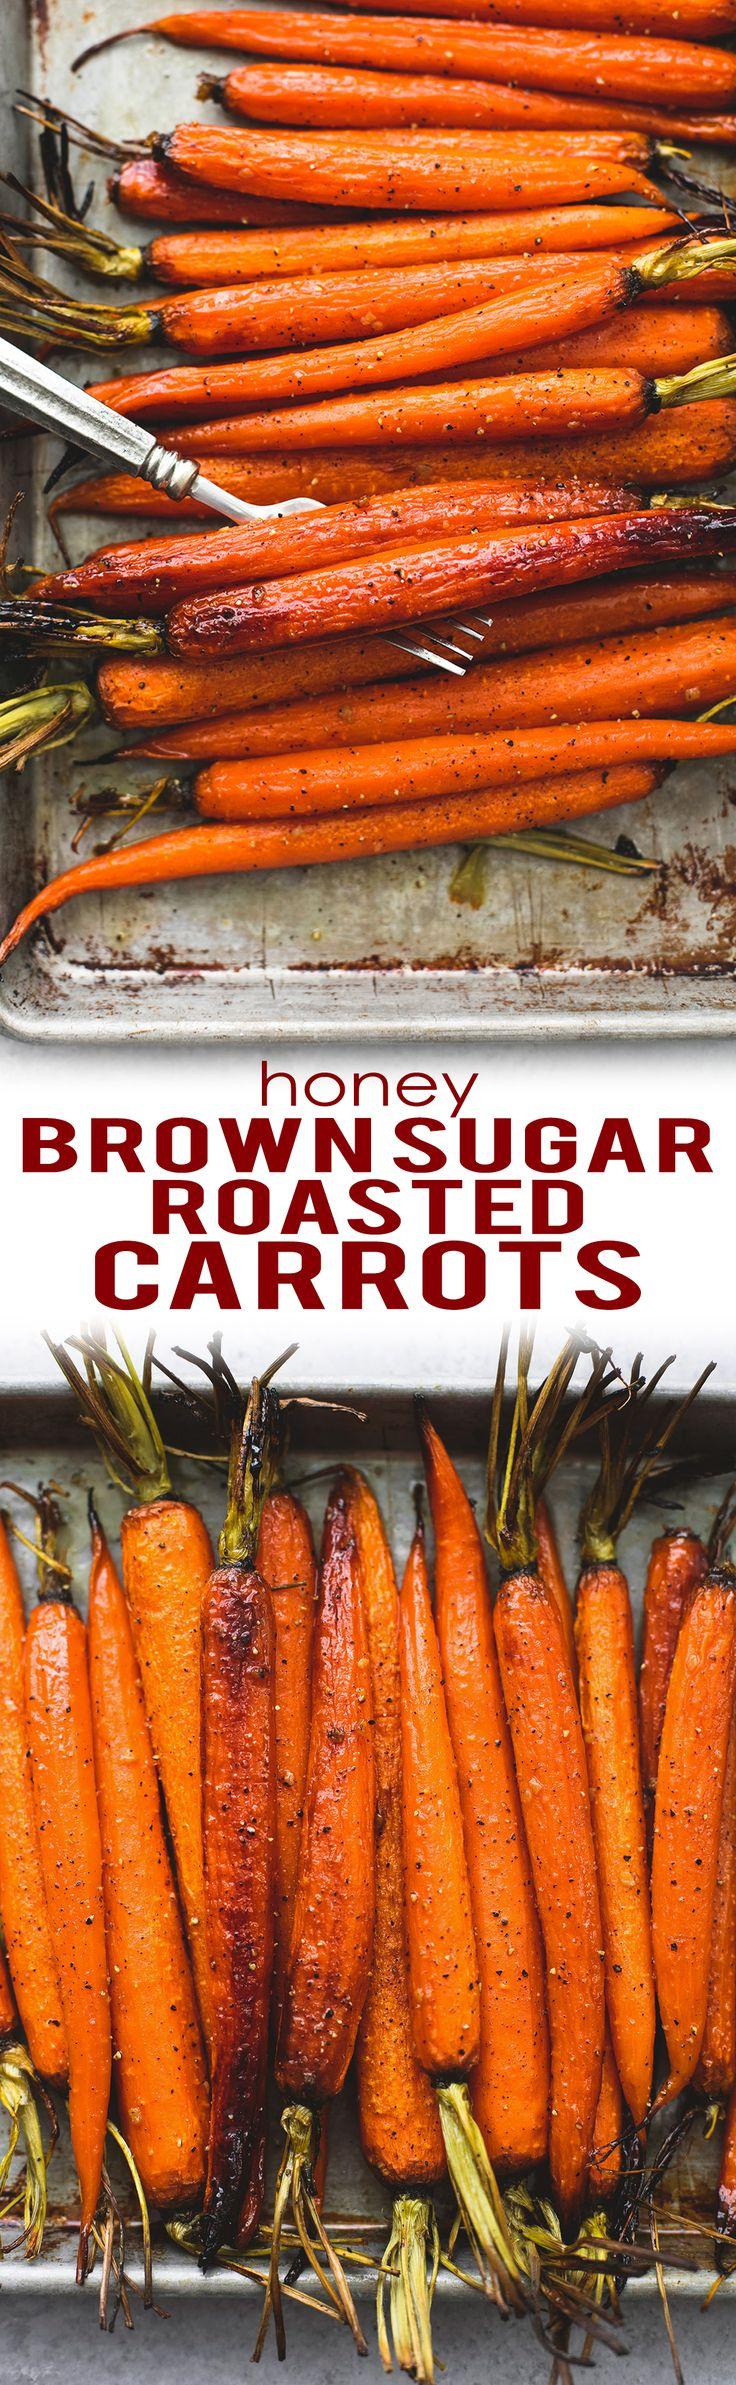 Honey Brown Sugar Roasted Carrots   lecremedelacrumb.com